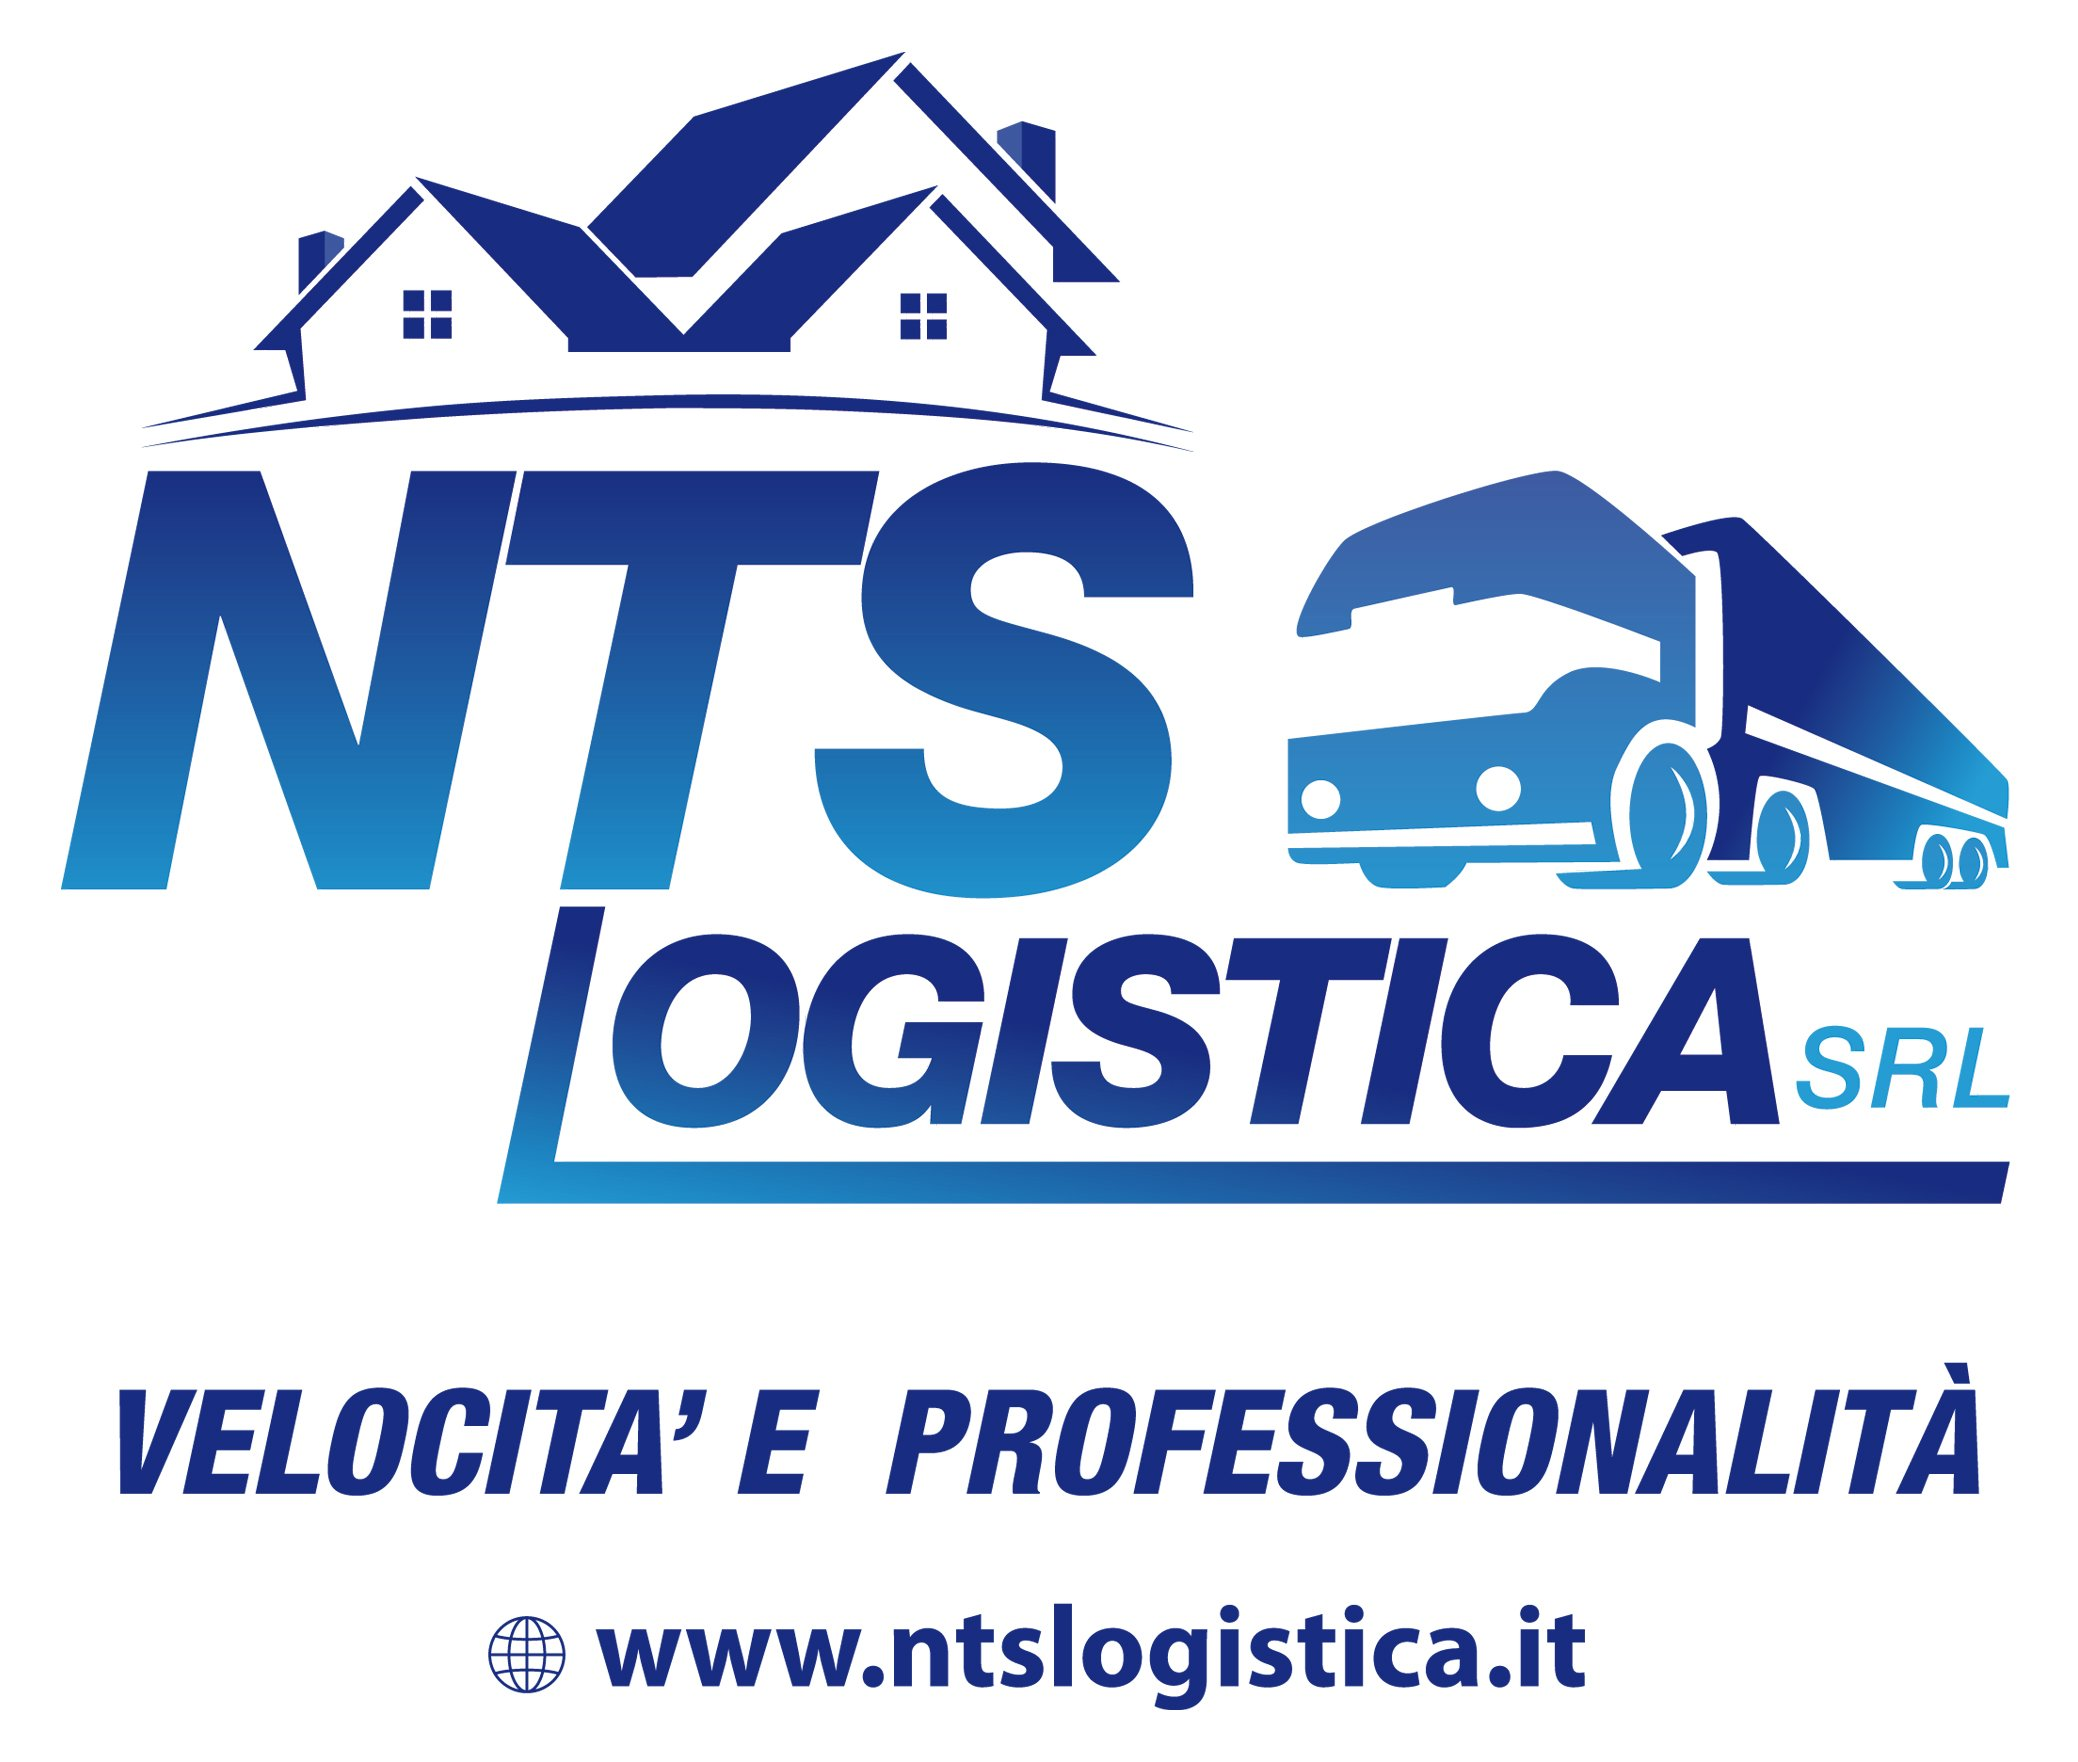 NTS LOGISTICA - LOGO